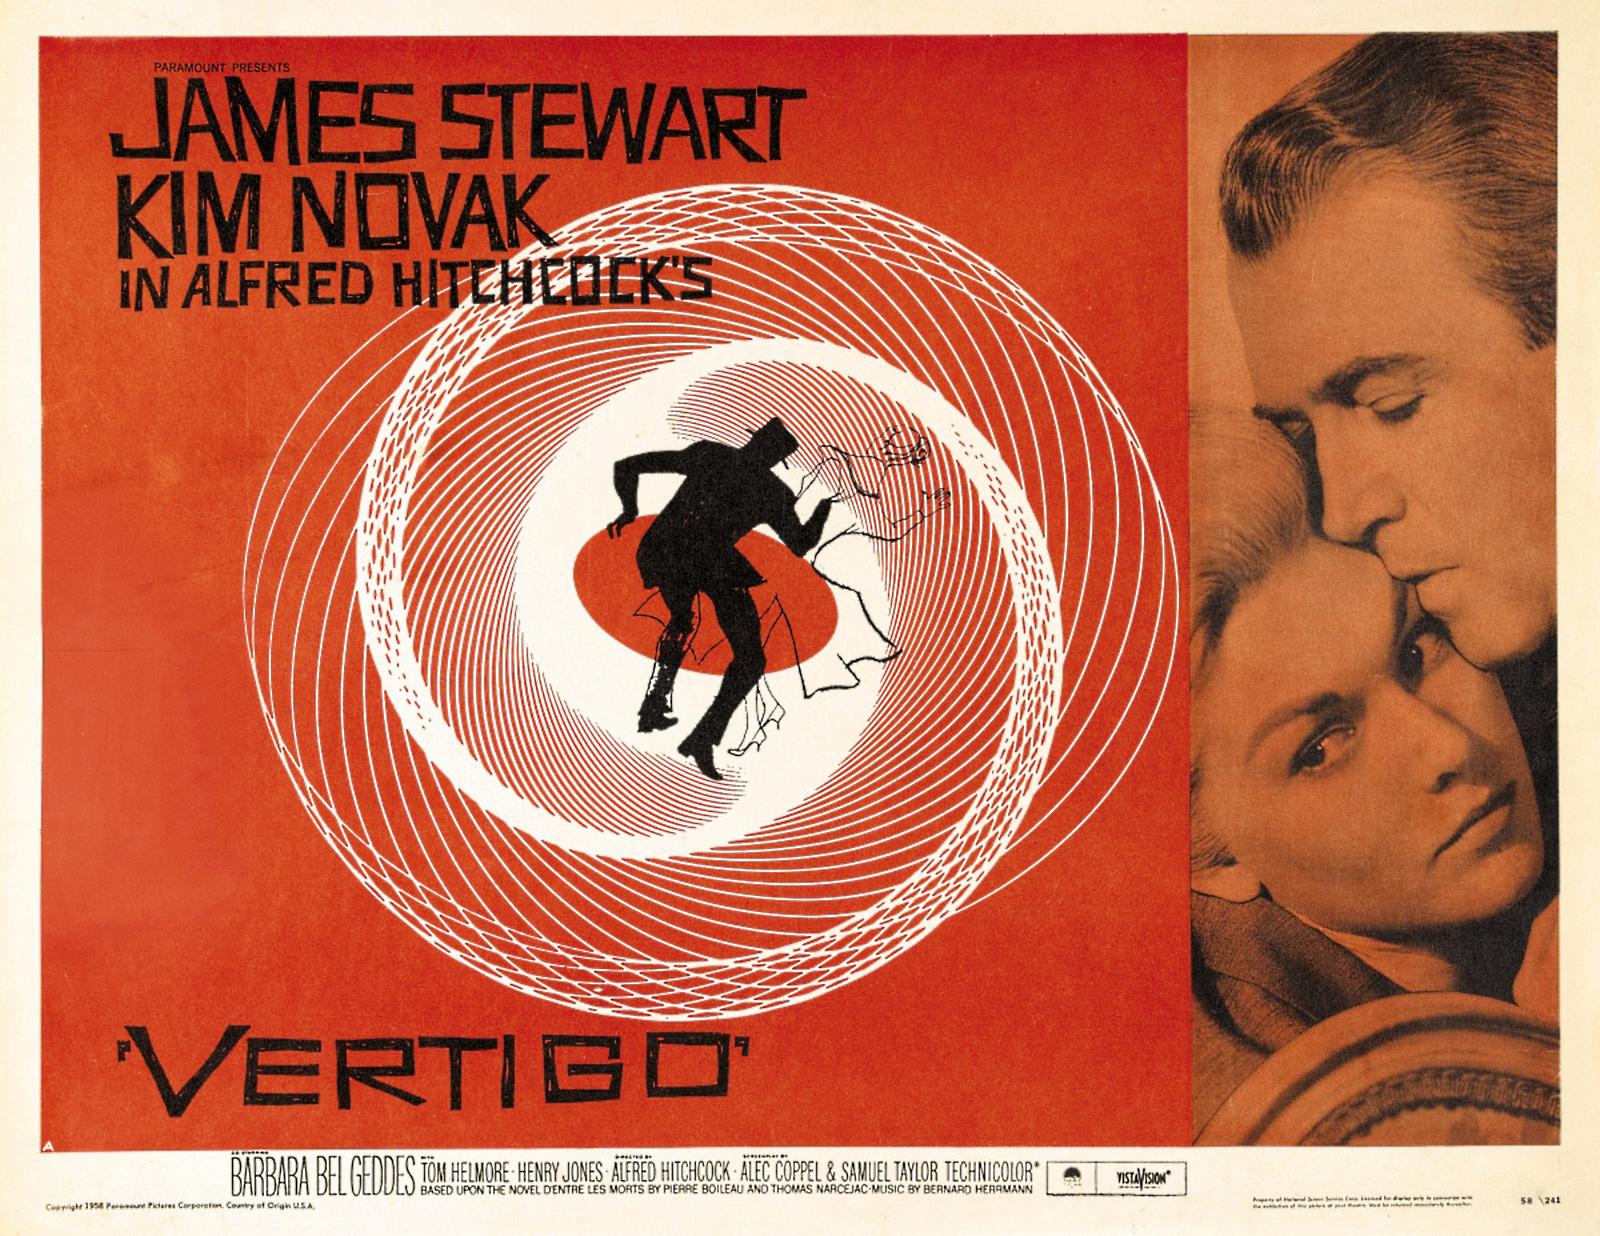 vertigo hitchcock Expanded hitchcock: vertigo saturday, january 28, 2017 / 2:00 pm - 5:00 pm  pollock theater screening format: 35mm film (85 minutes) with james katz.